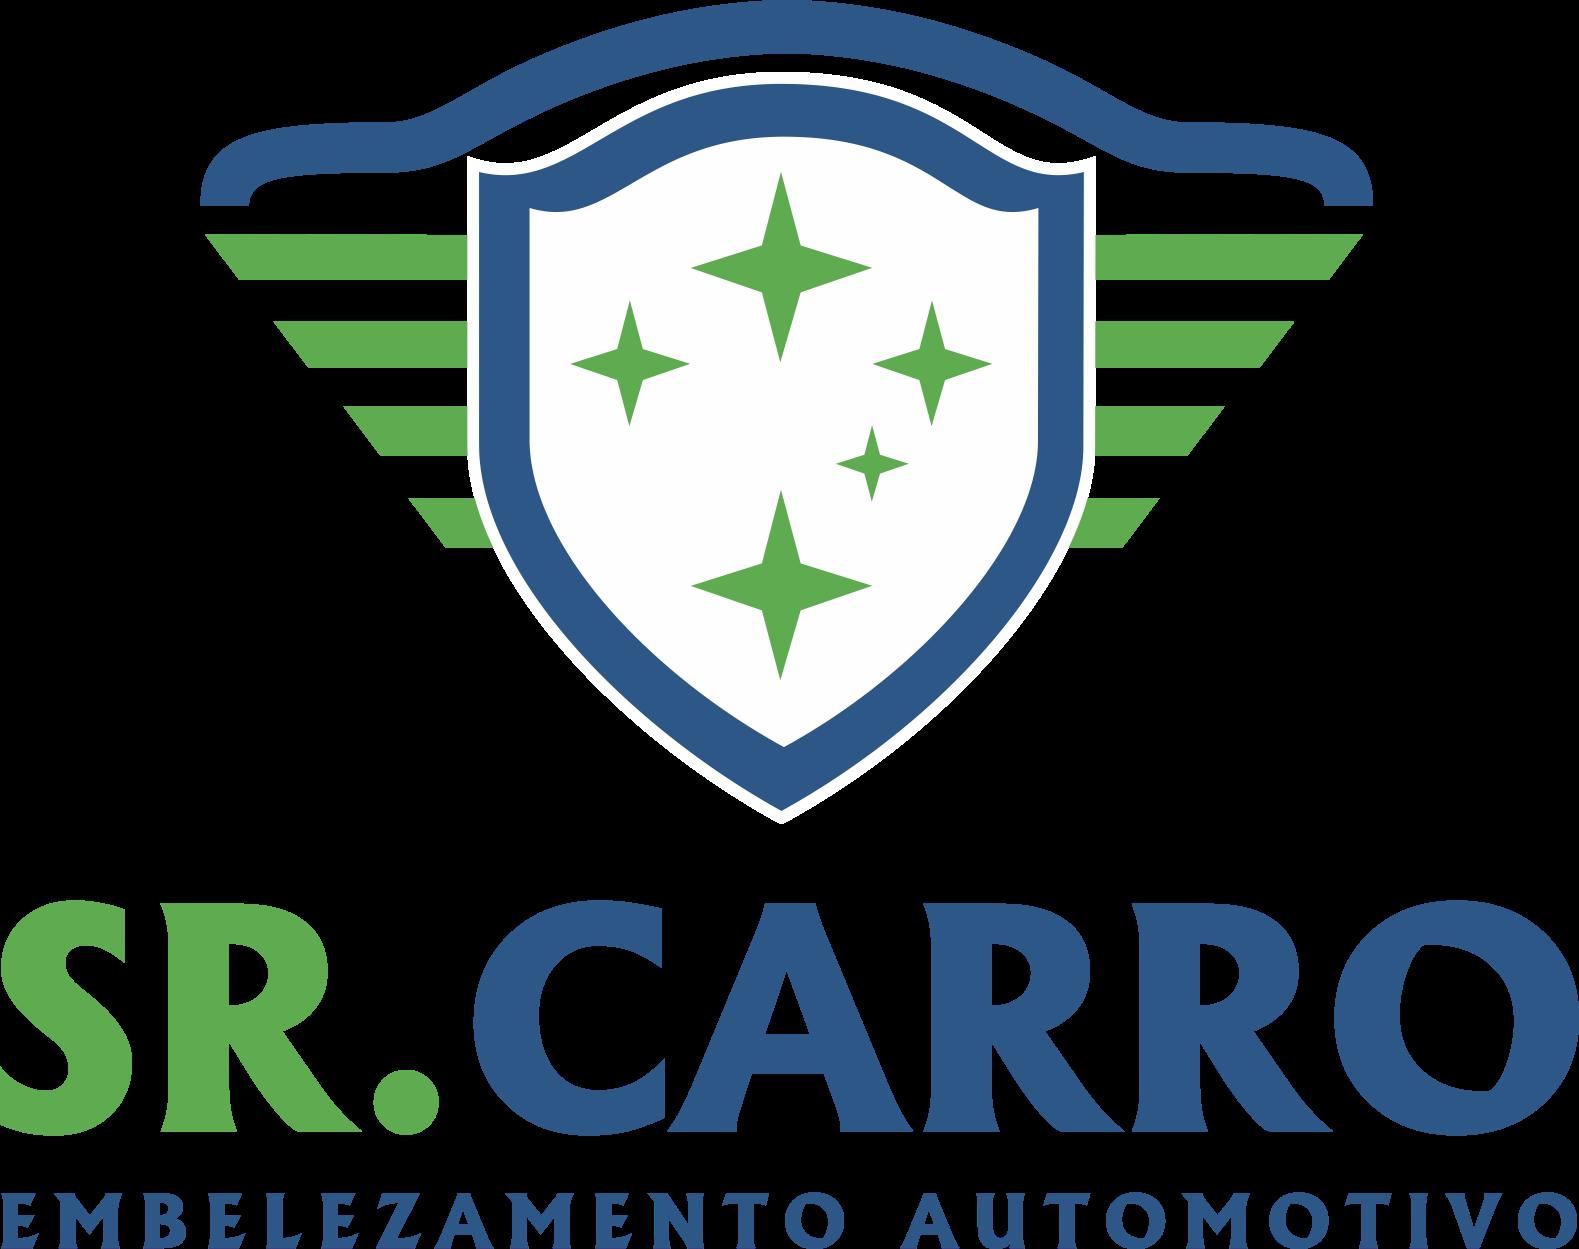 Marca - SR. CARRO